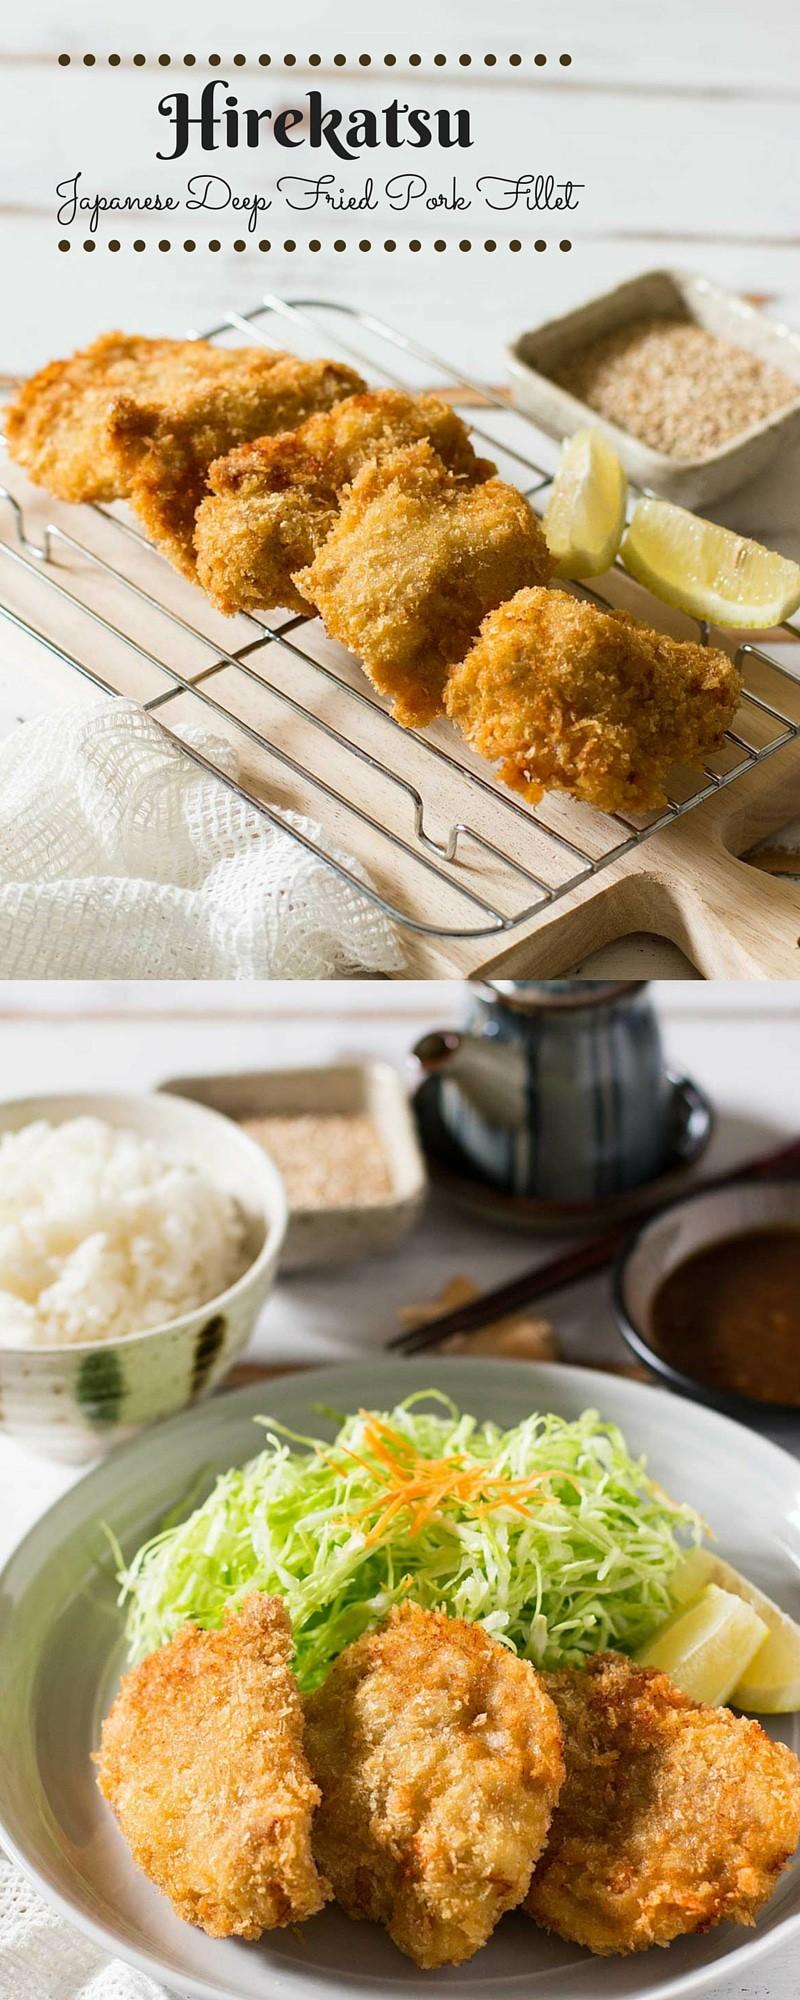 Hirekatsu - Japanese Deep Fried Pork Fillets